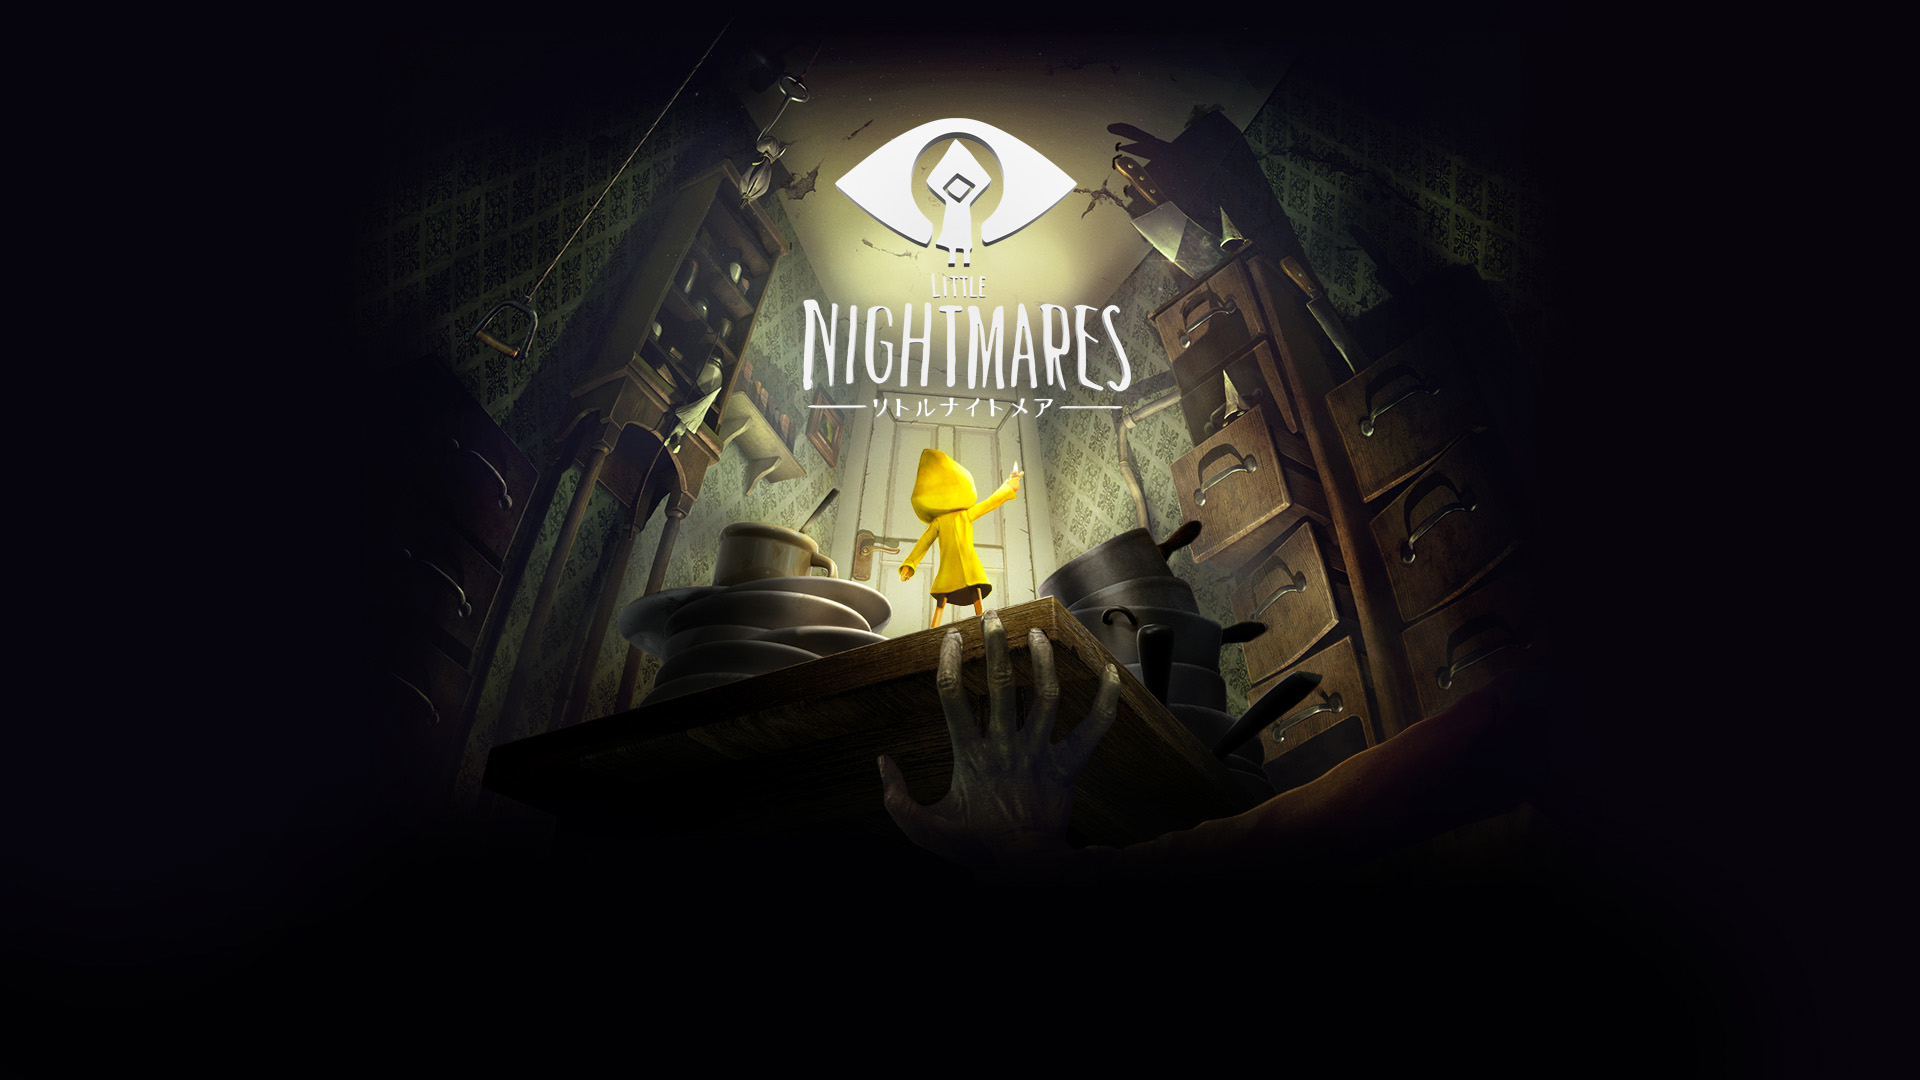 LITTLE NIGHTMARES リトルナイトメア の画像 p1_21